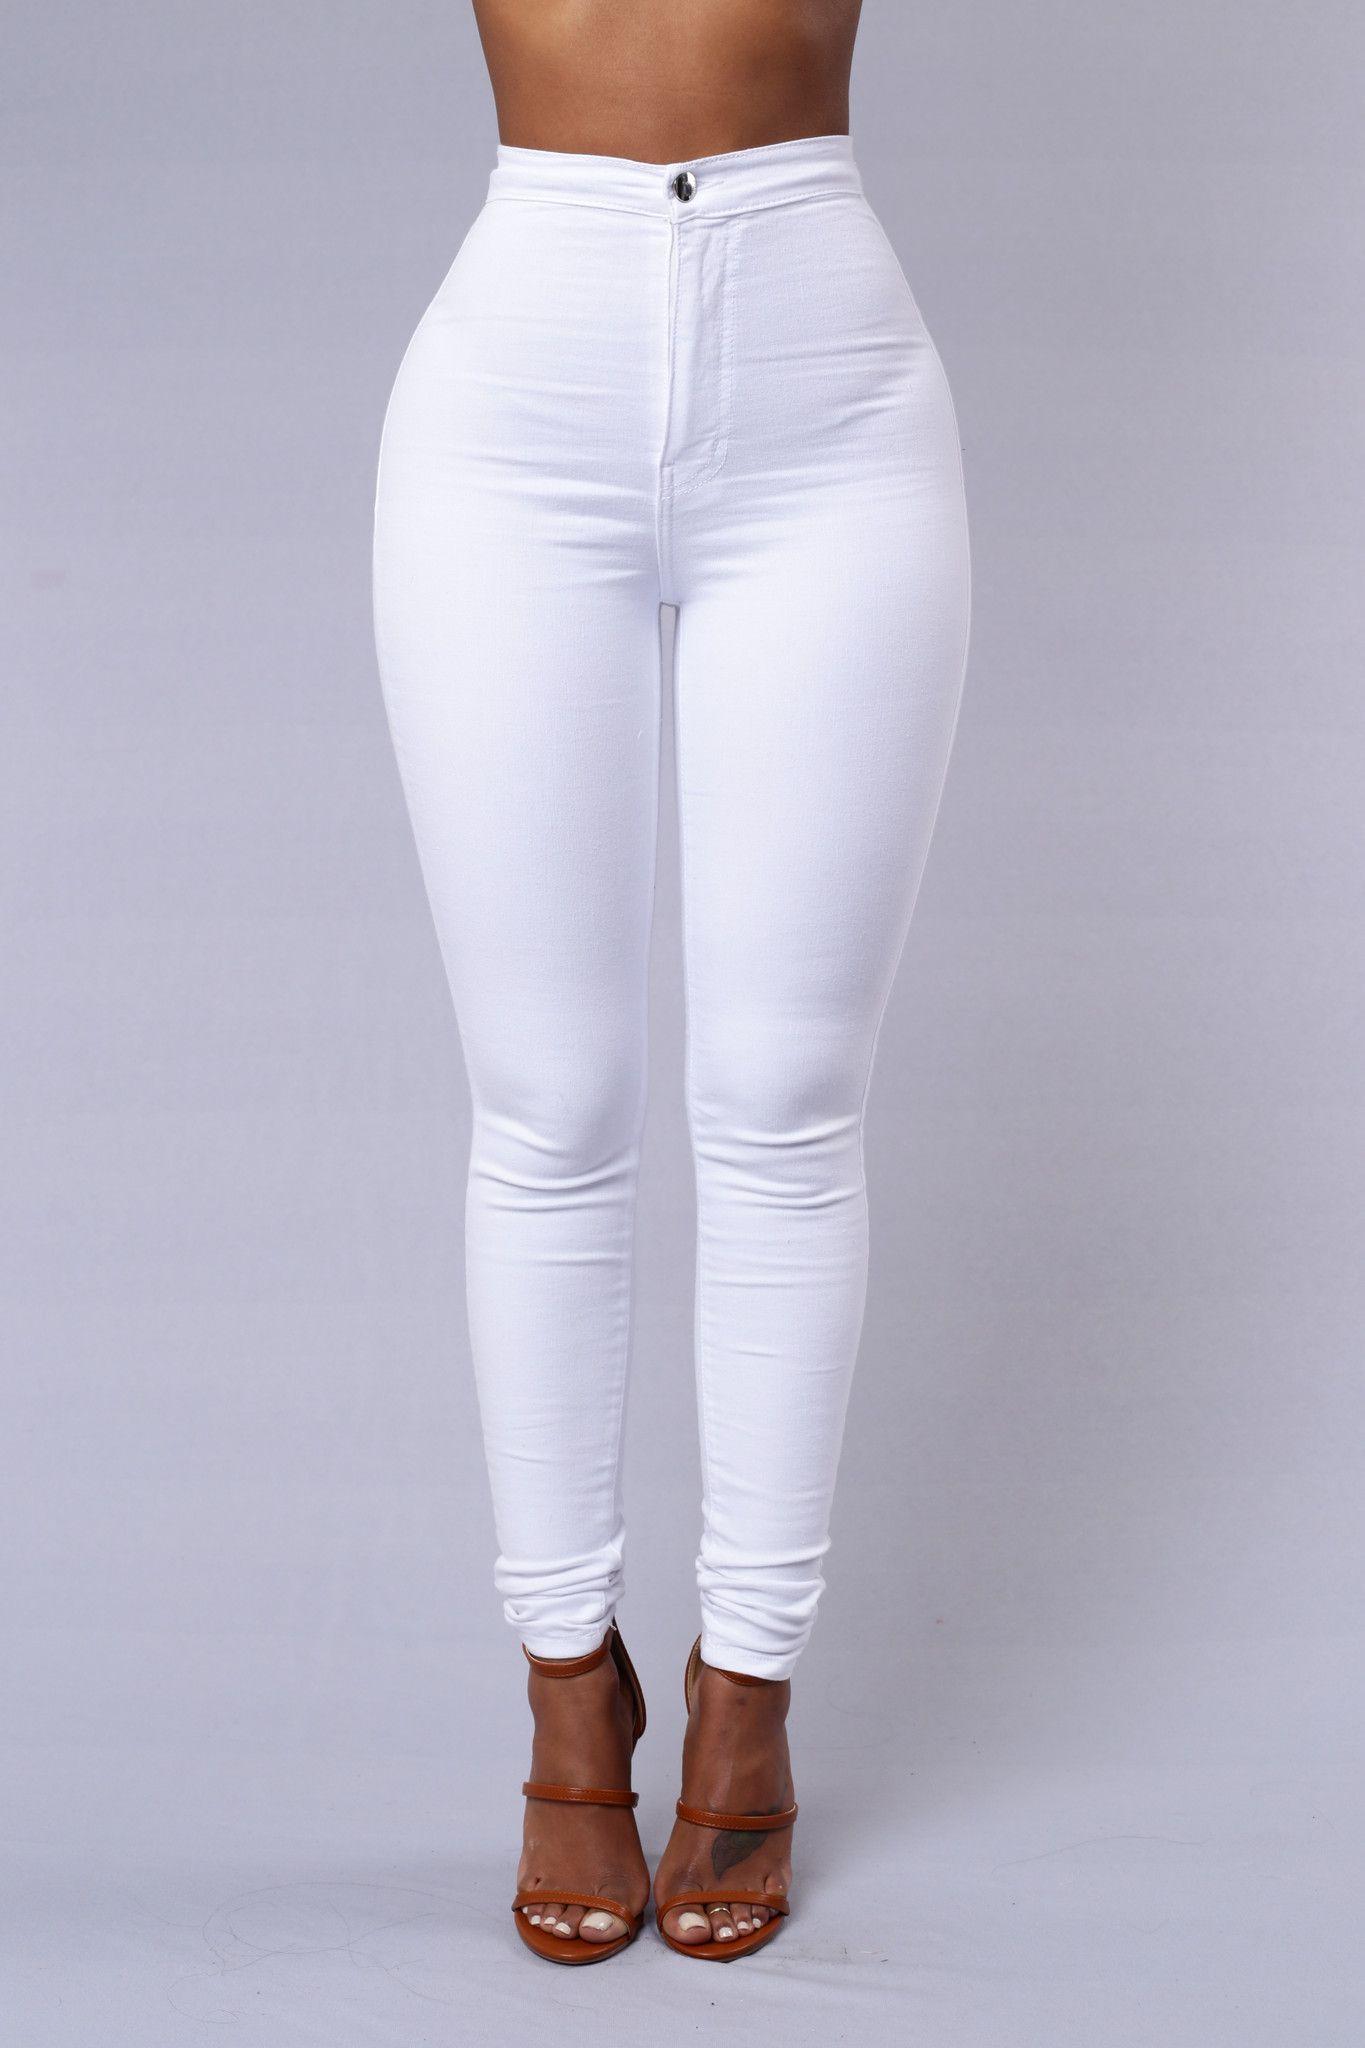 Park Art|My WordPress Blog_One Size Fits All Jeans Australia